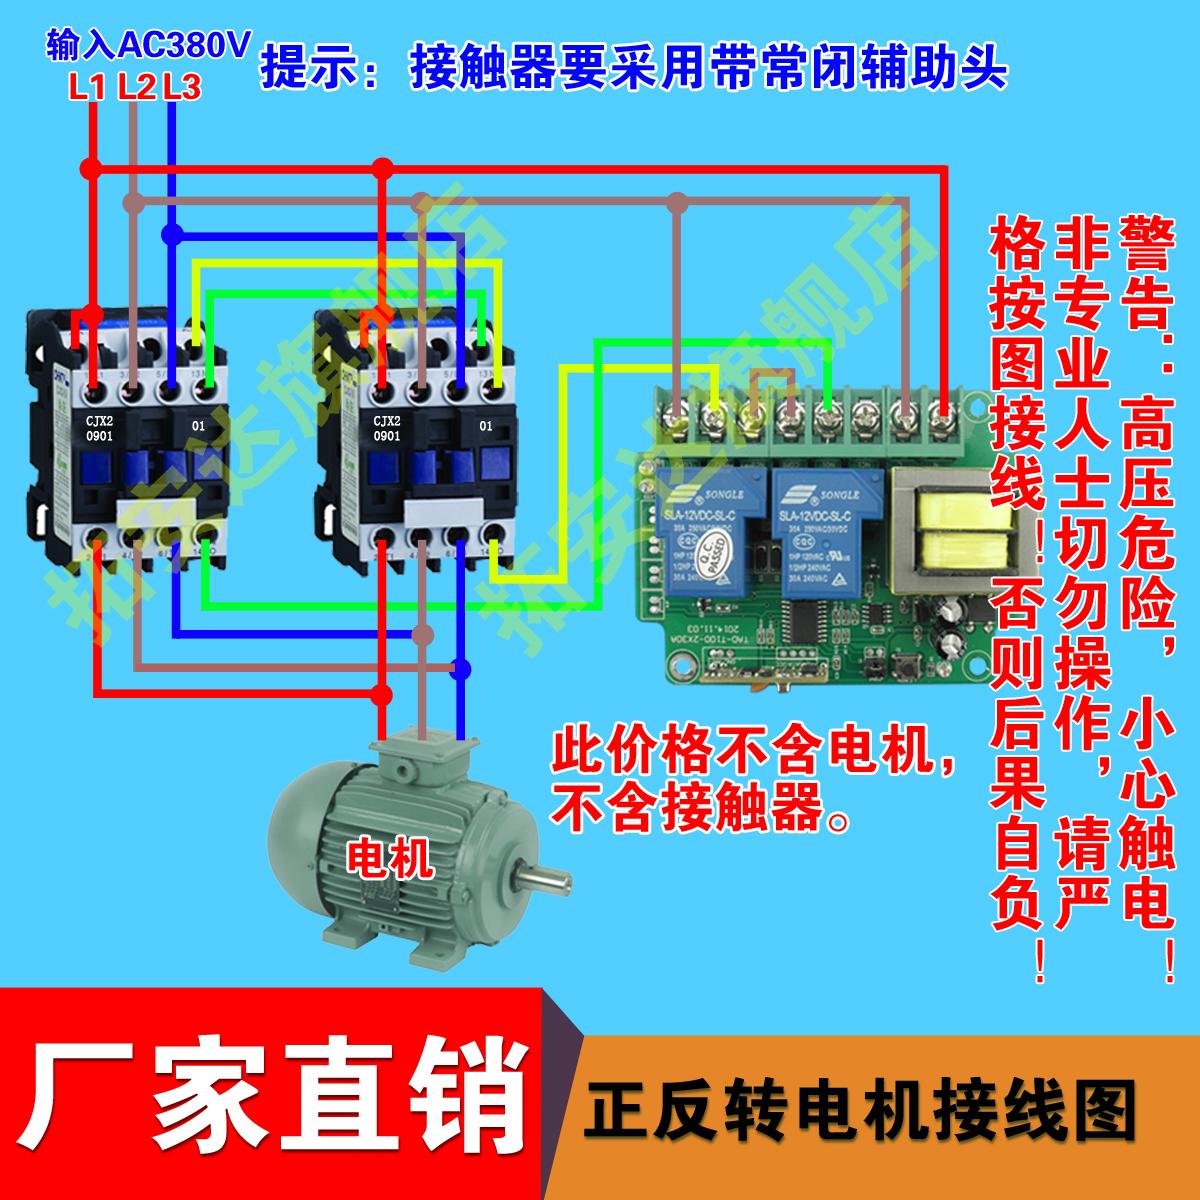 380V positive inversion motor wireless remote control switch 2 / greenhouse / gate / roll gate / big button remote controller